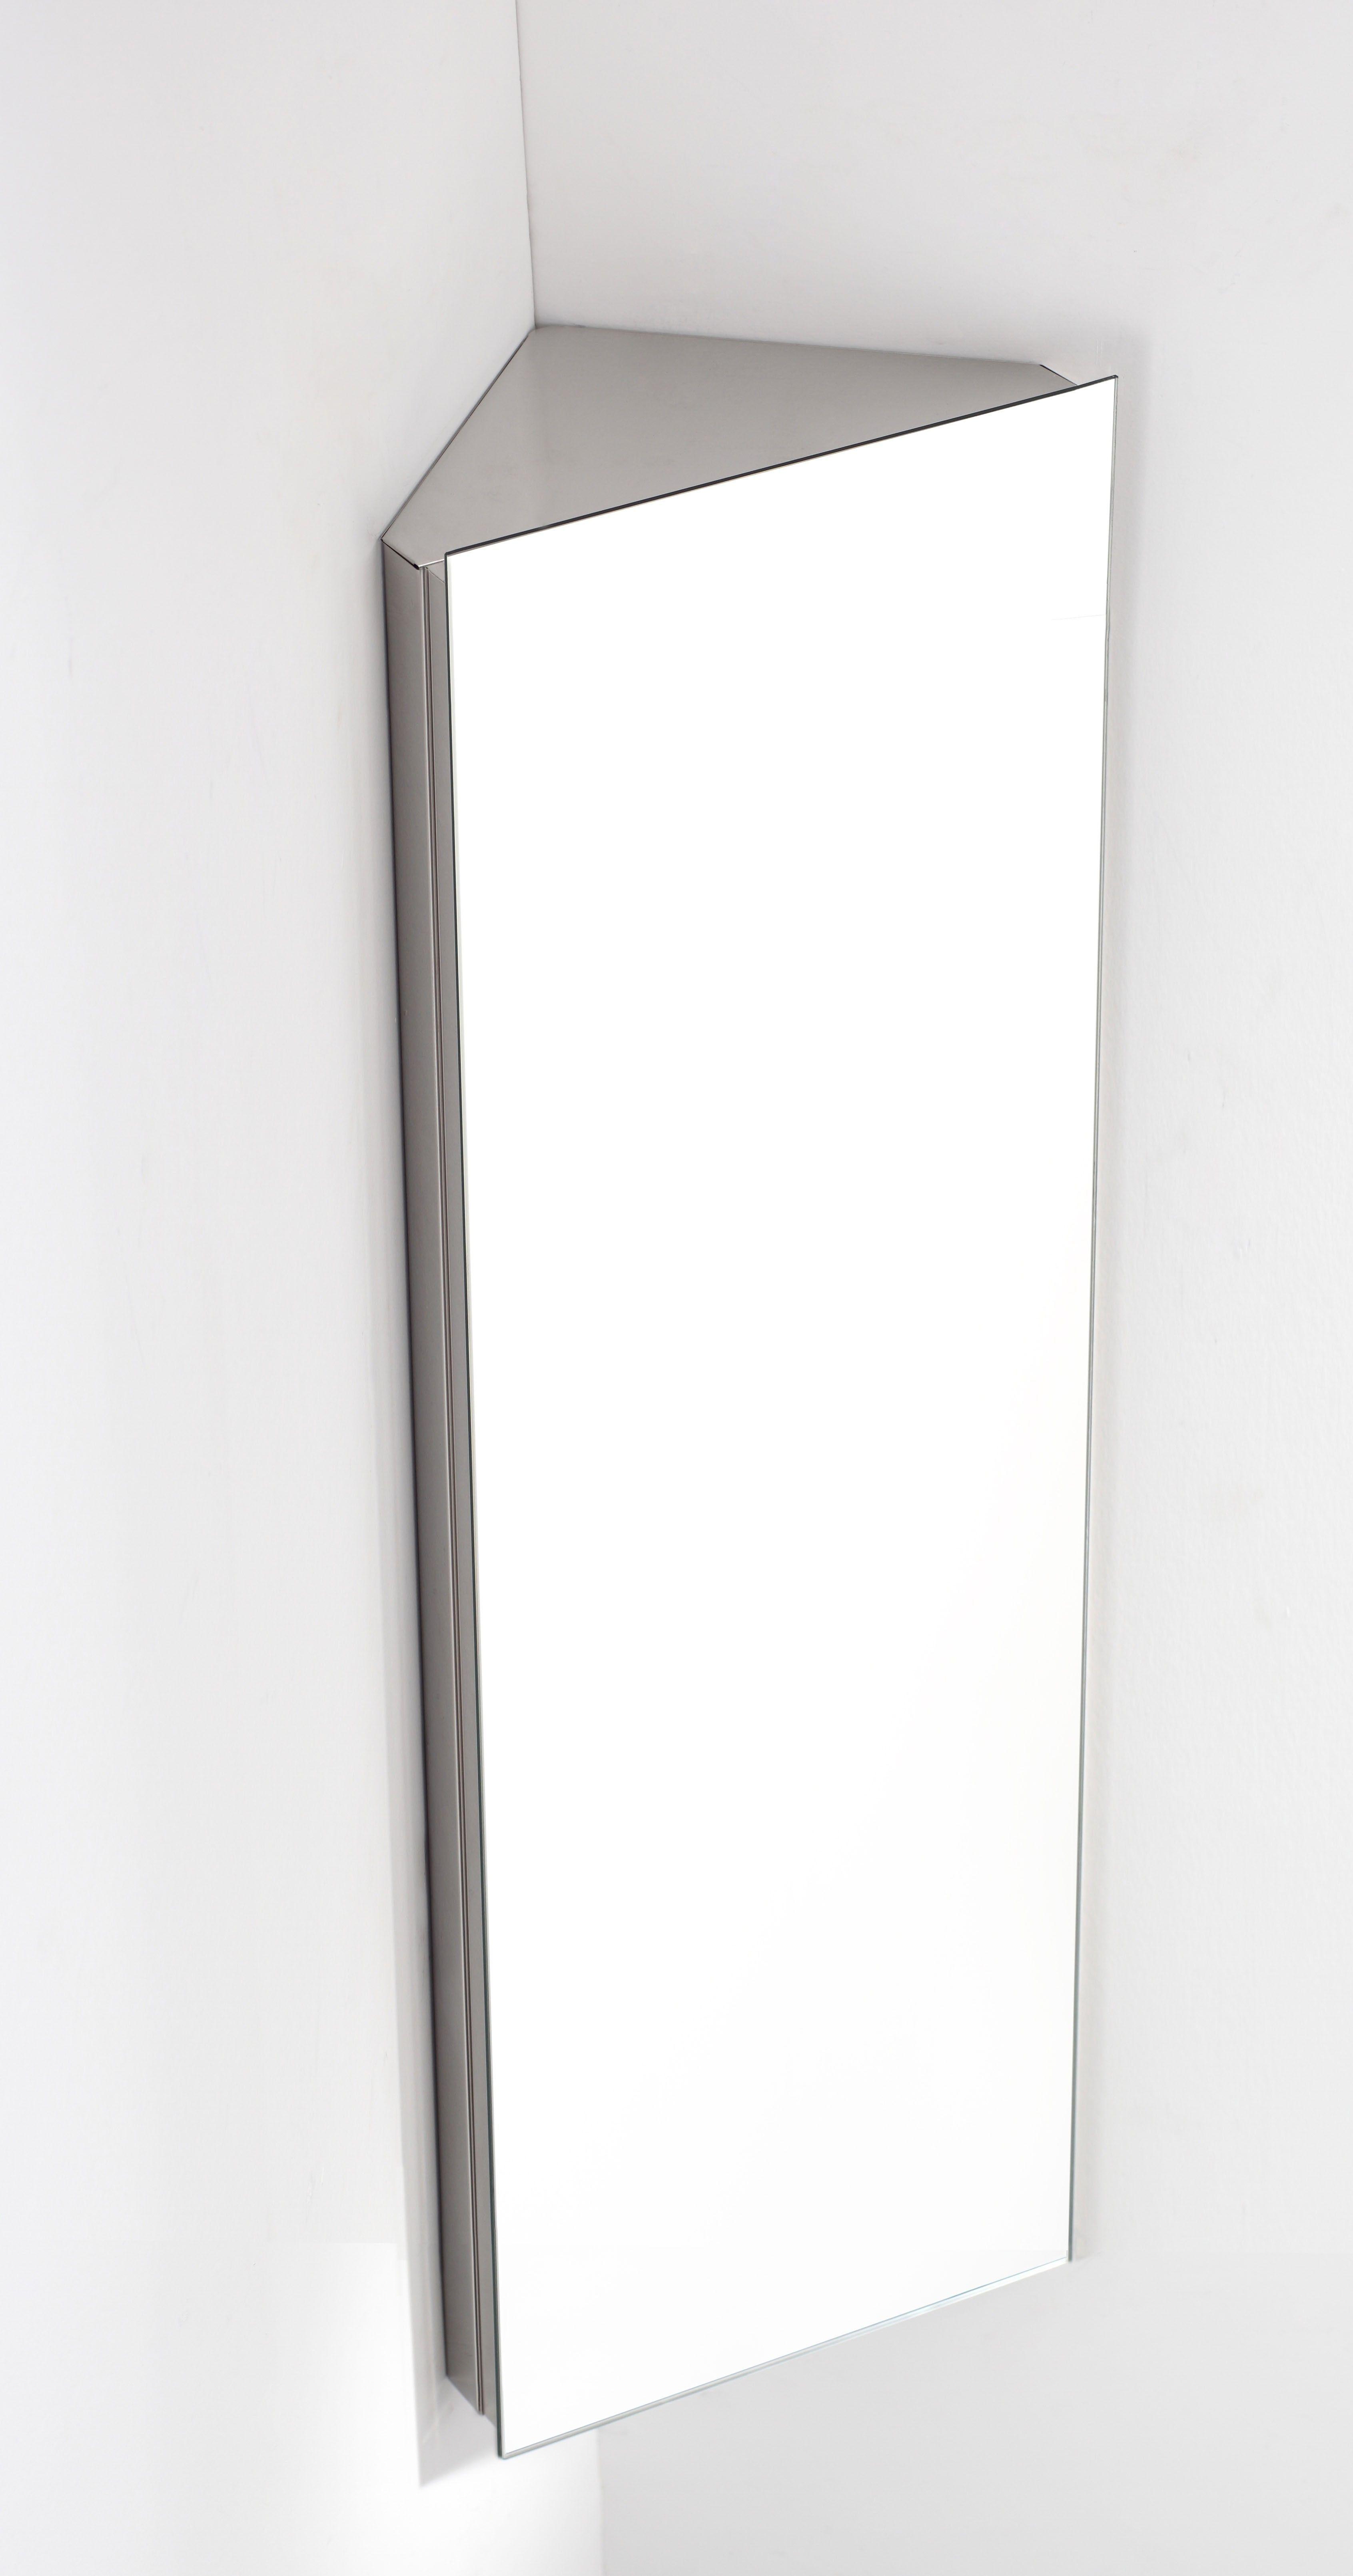 Large Corner Bathroom Cabinet One Tall Mirror Door 1200mm X 380mm